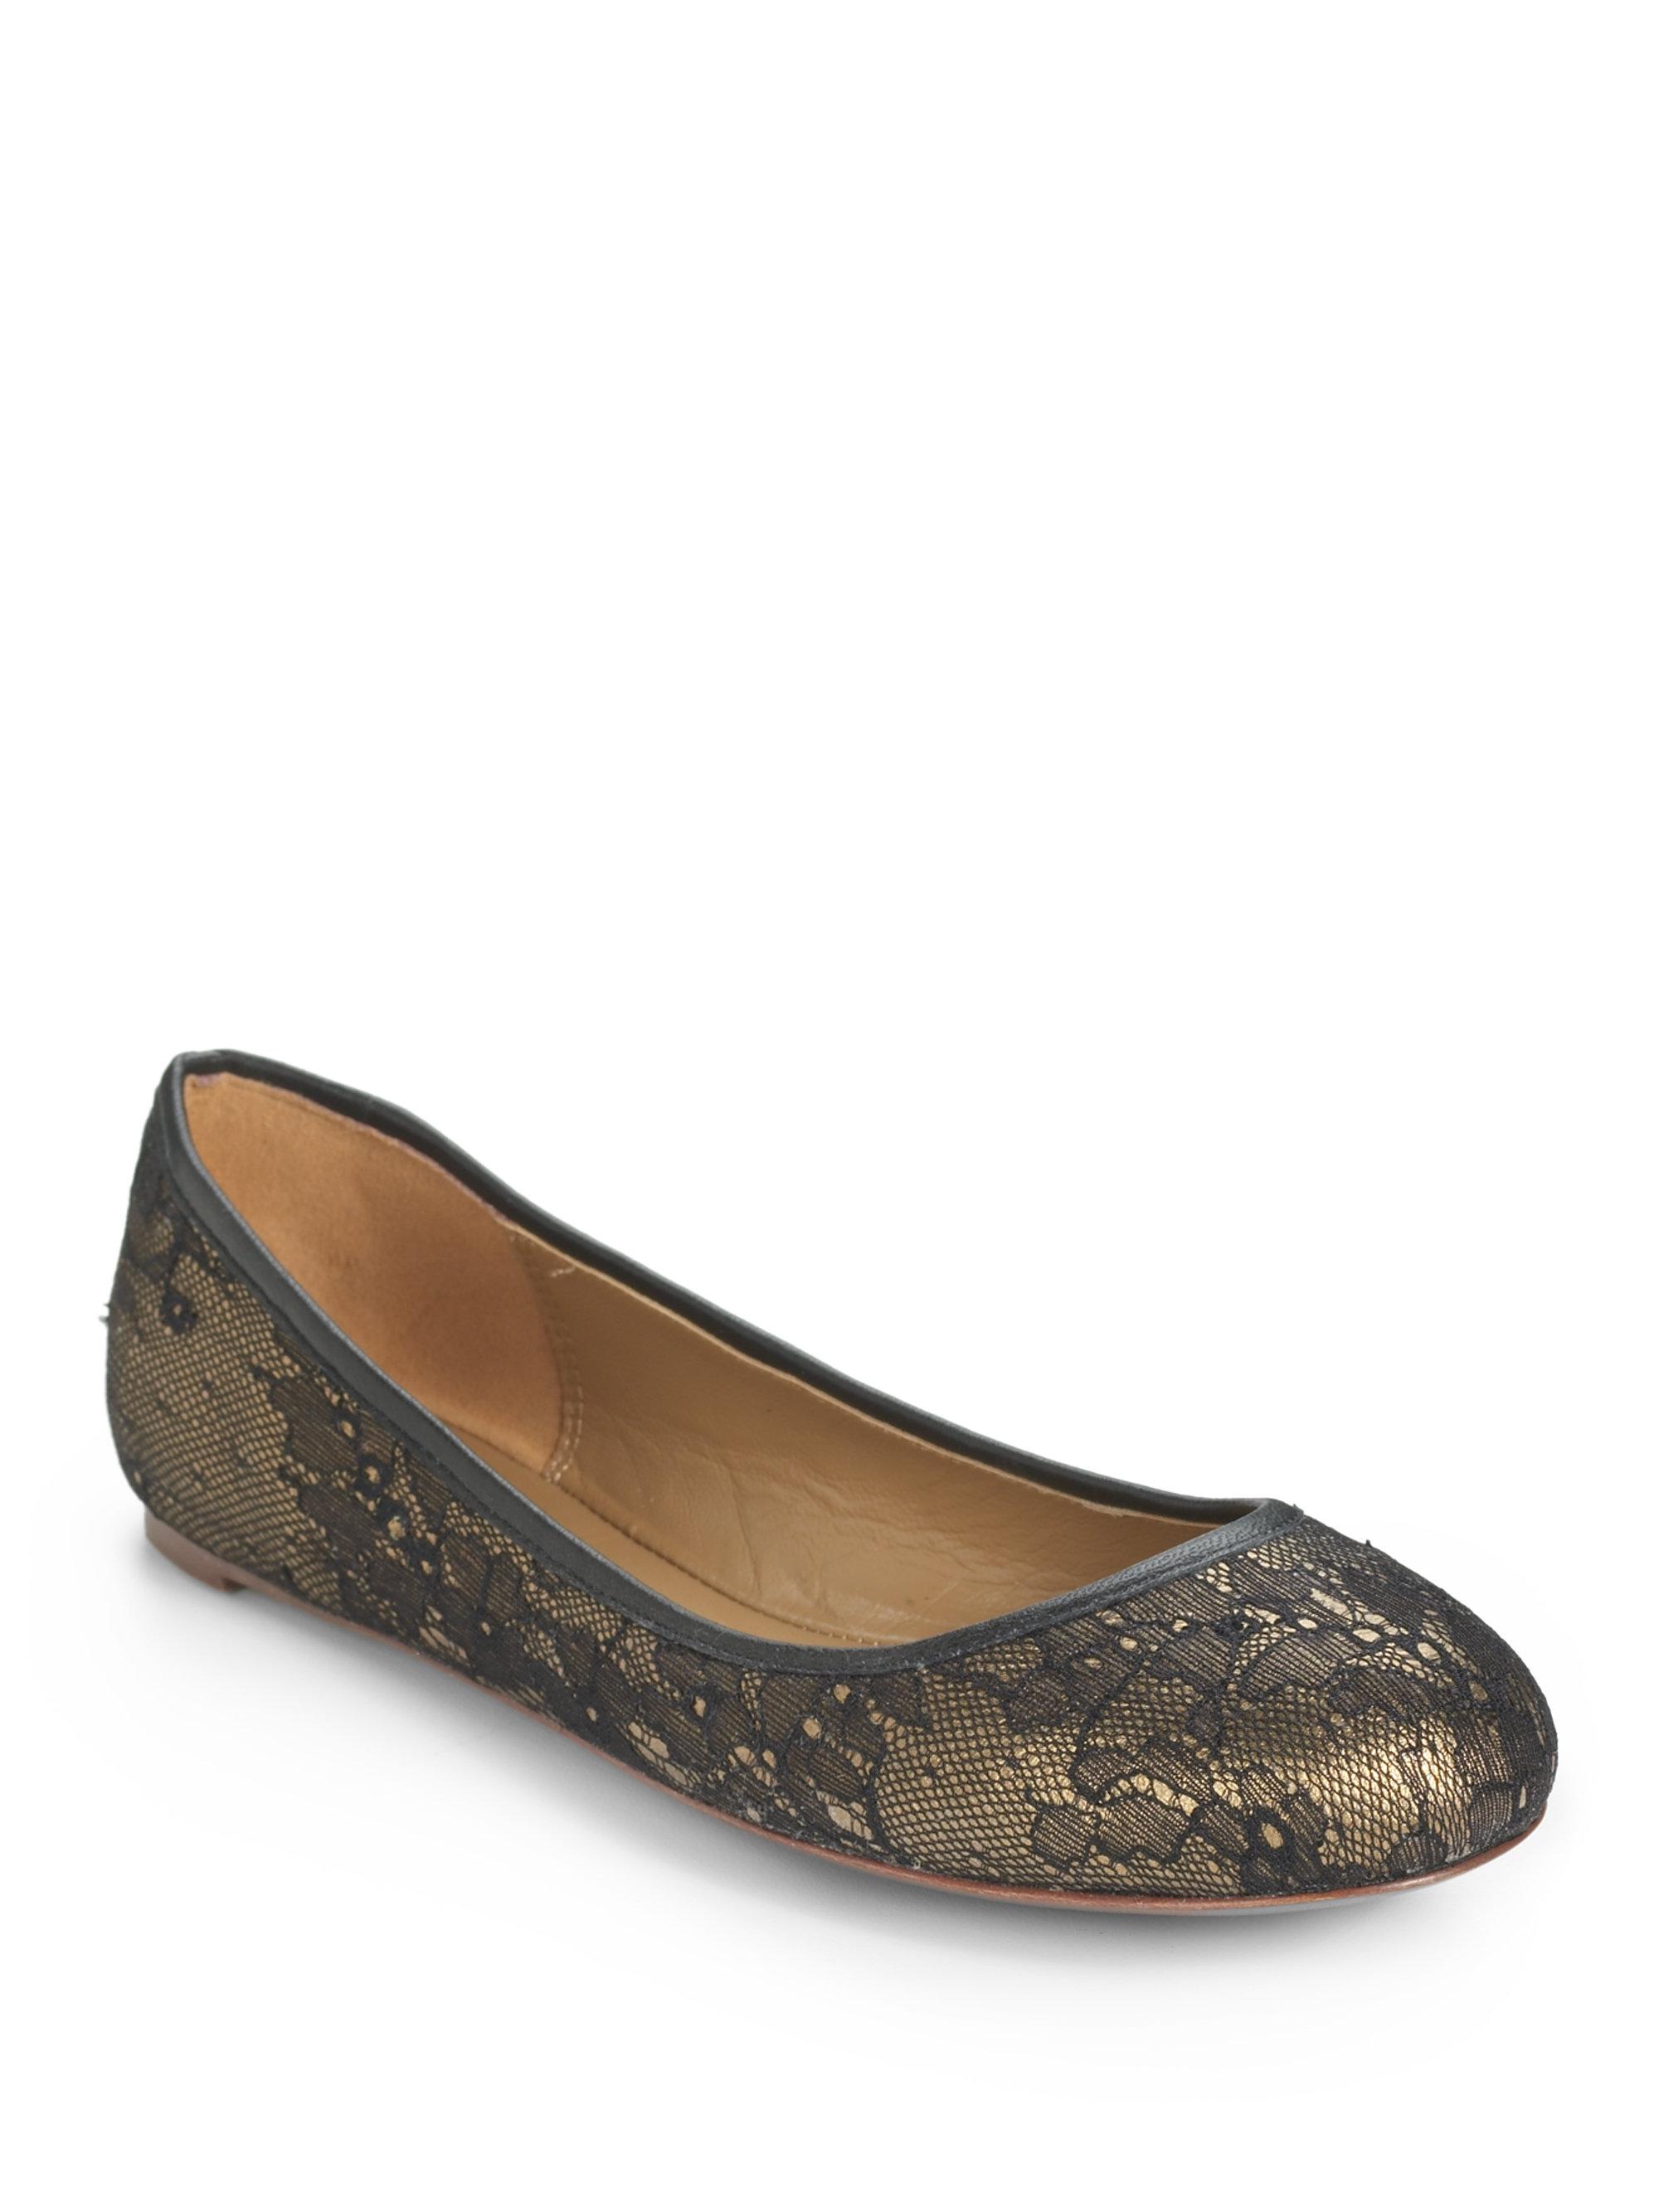 Elie Tahari Venus Lace Ballet Flats in Black blackgold